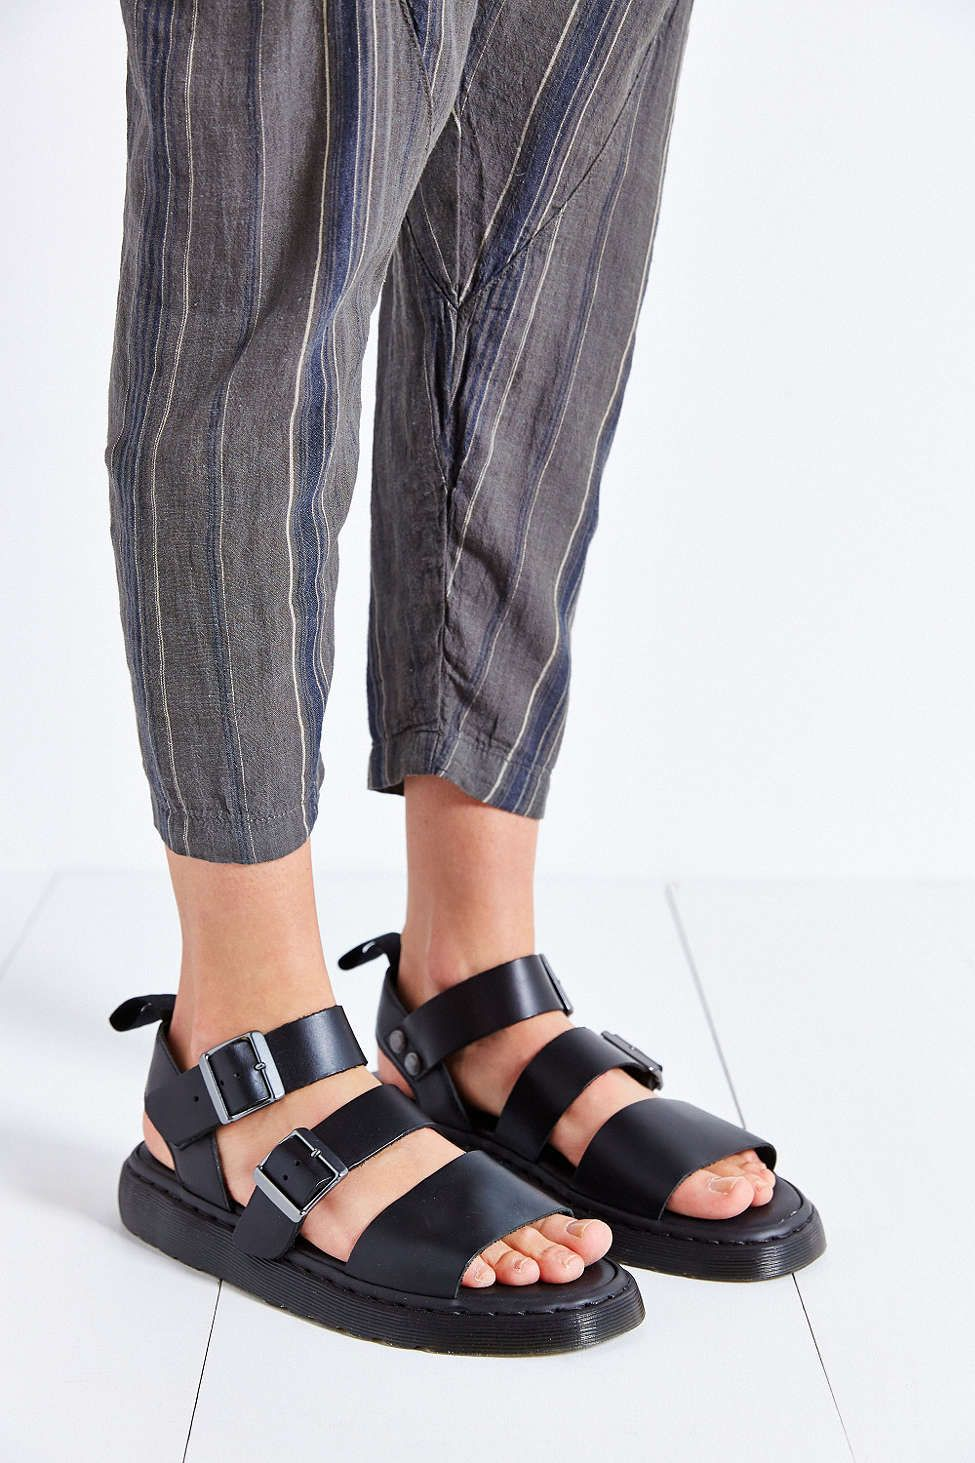 Best 25 Dr Martens Sandals Ideas On Pinterest Dr